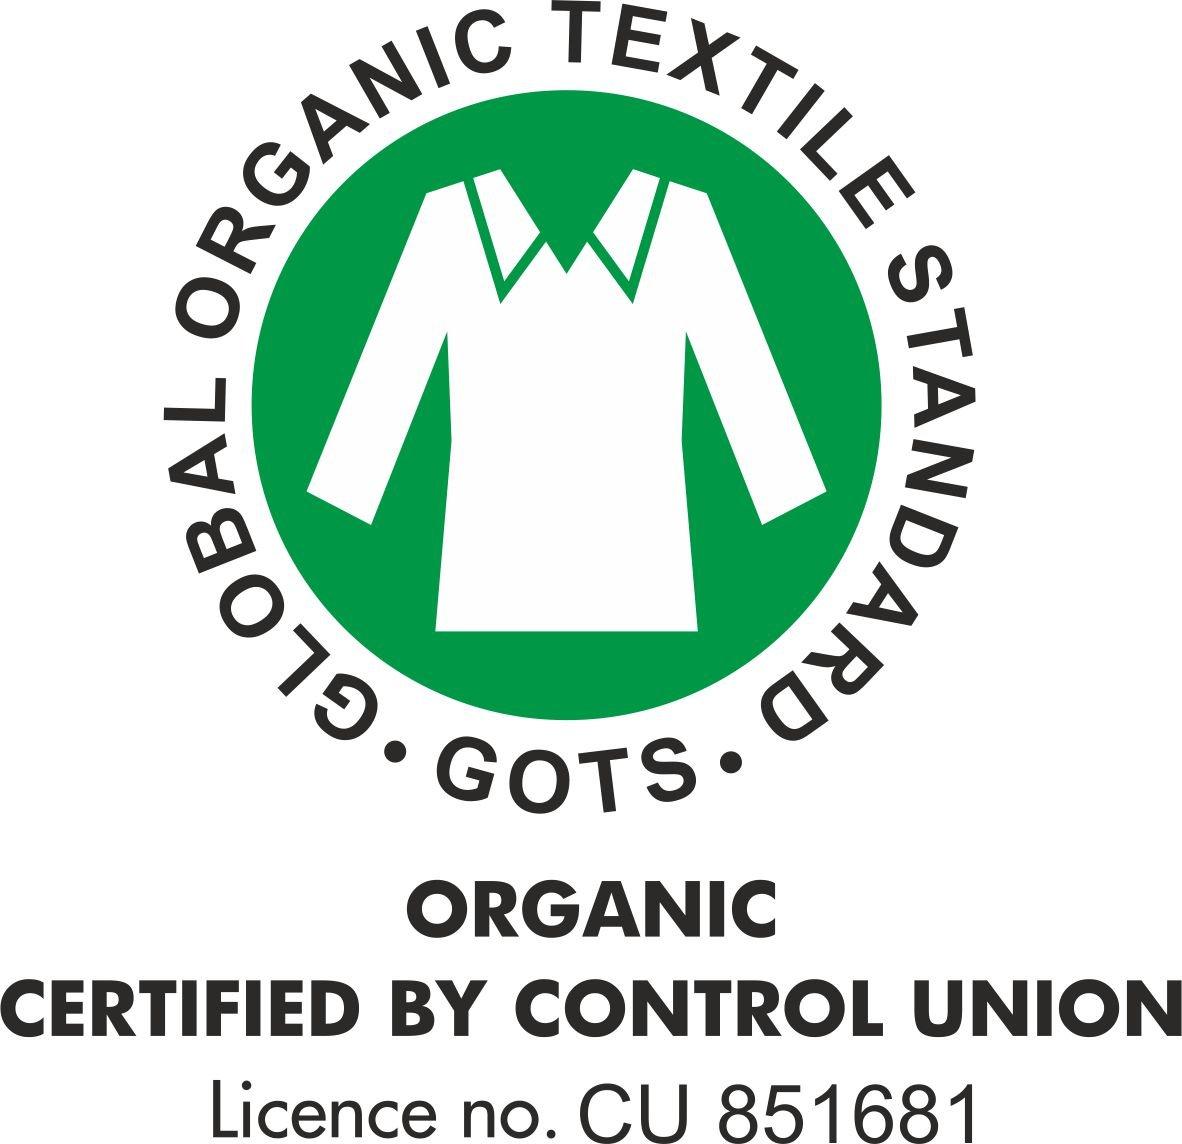 Grund Sea Pines Chemical Free 100% Organic, Large, Driftwood, 1 pieceganic Throw Blanket by Grund (Image #4)